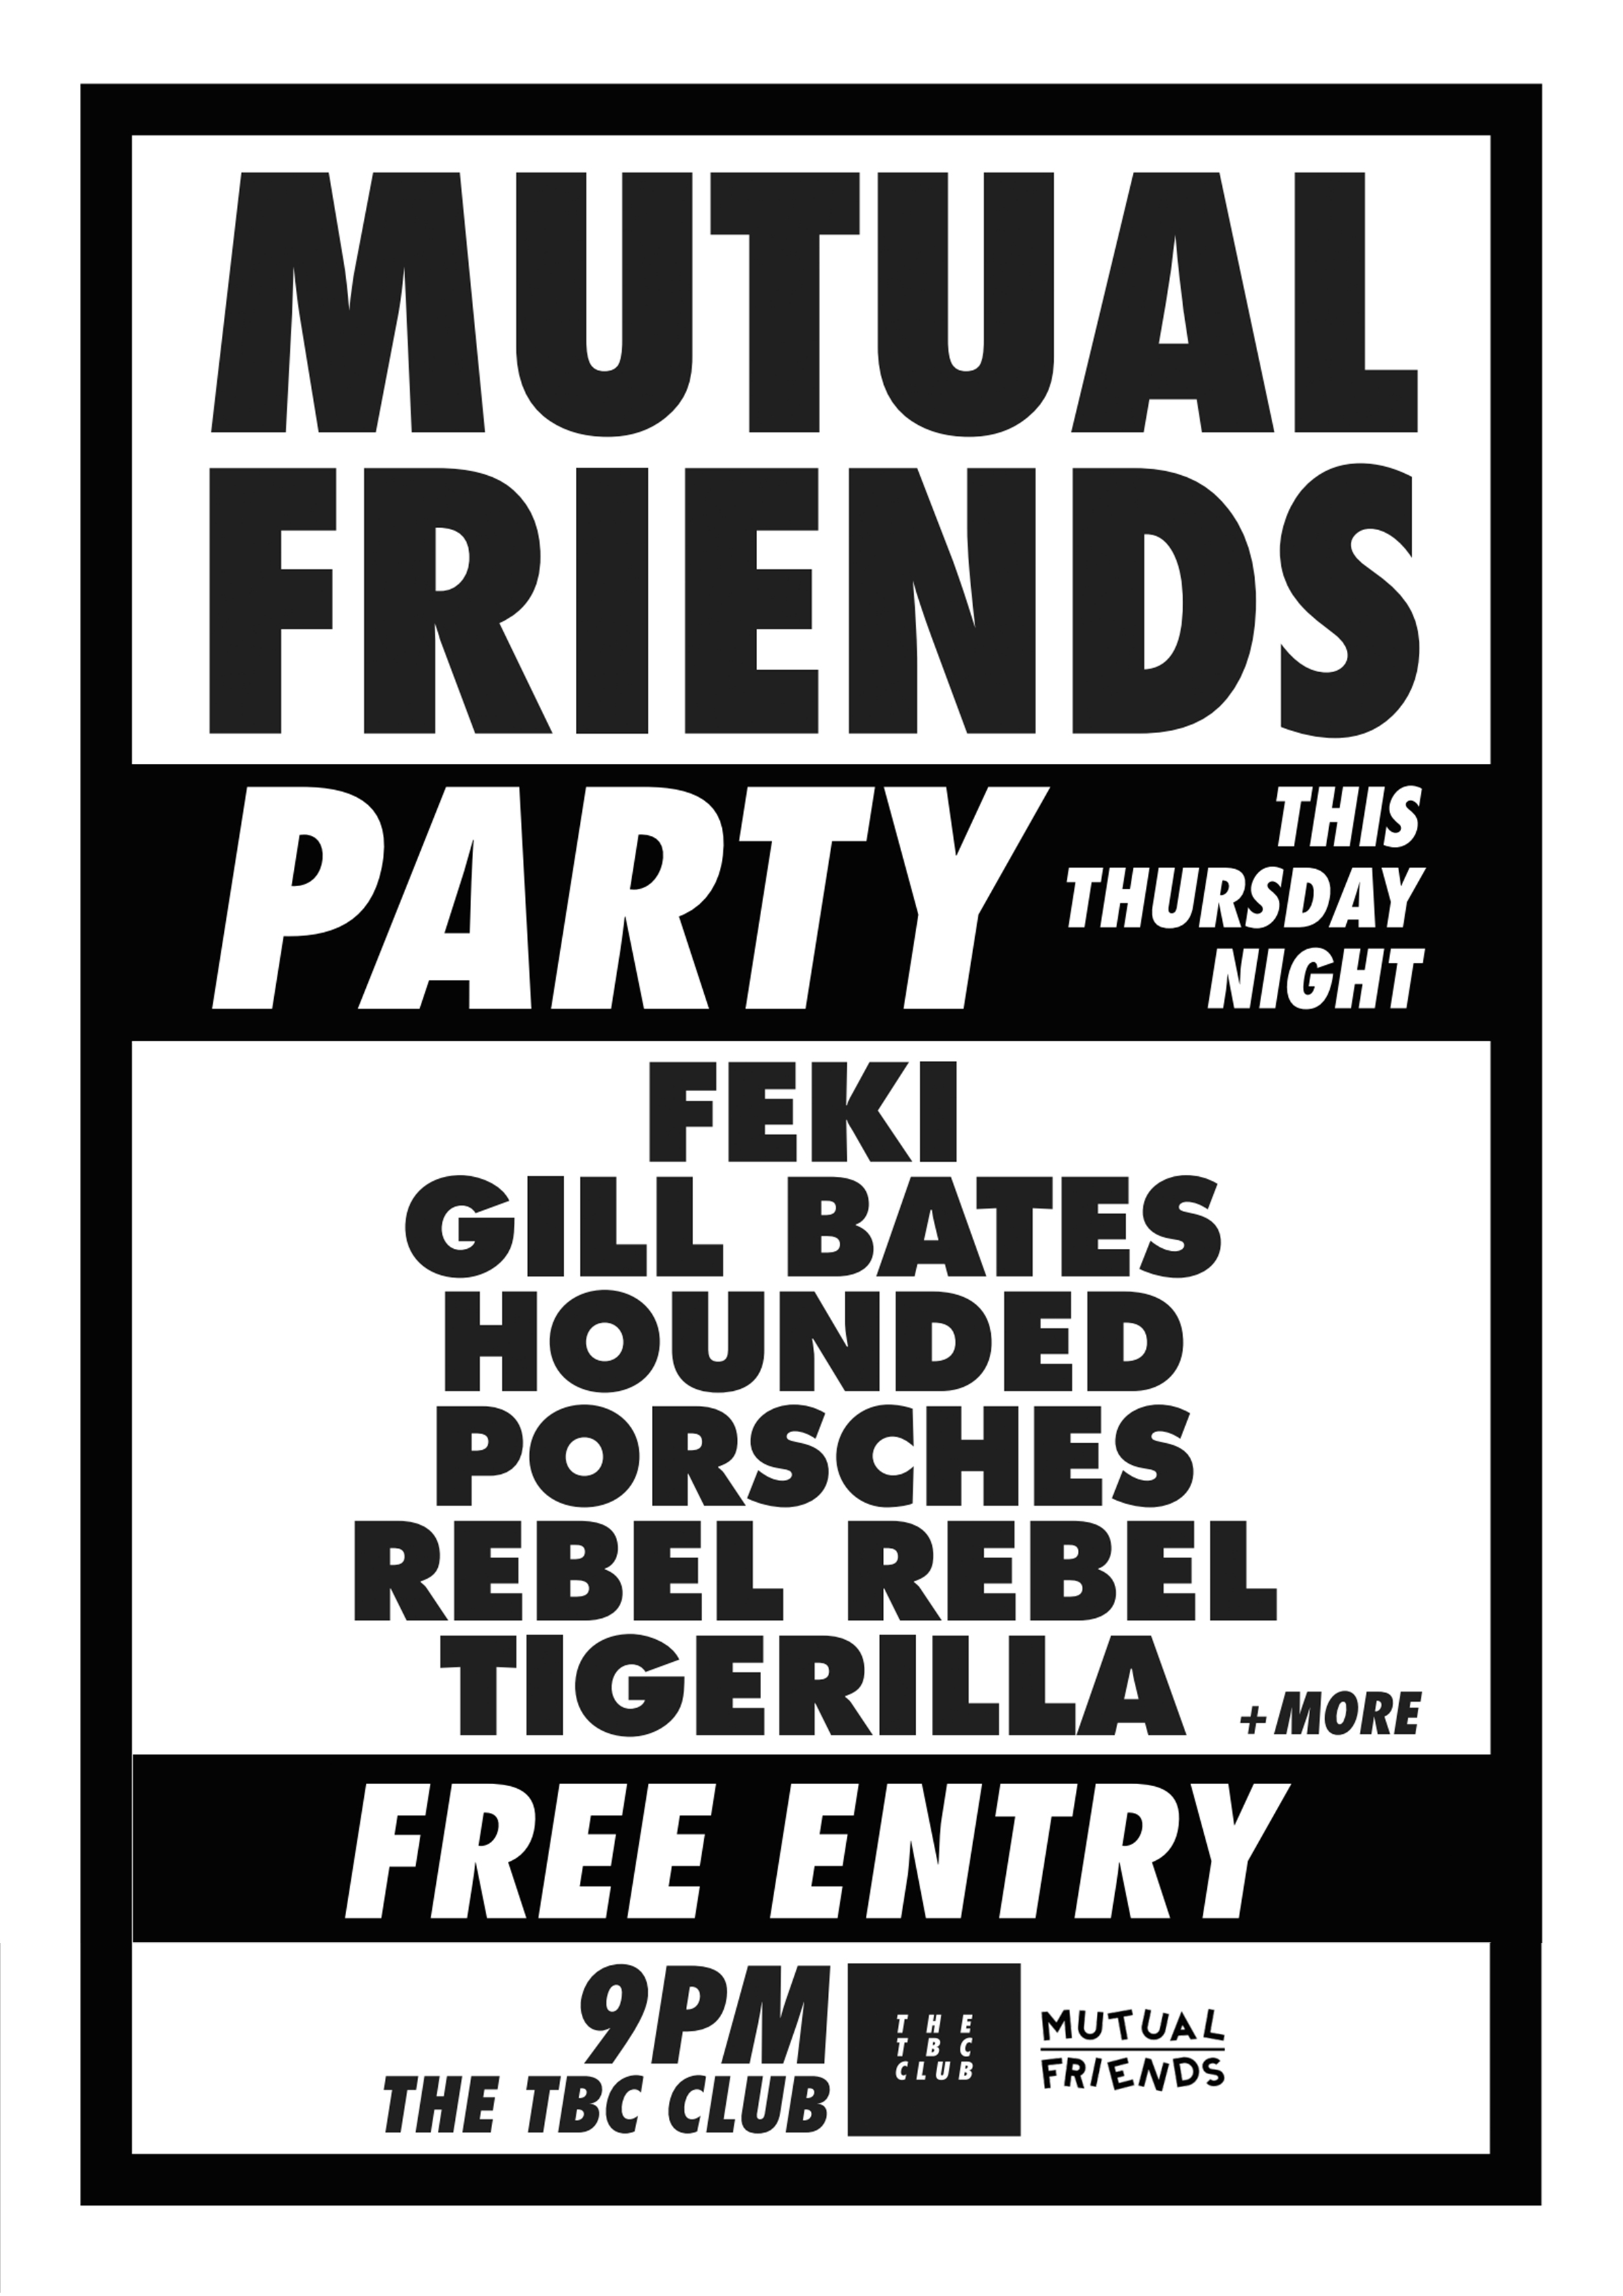 mutualfriends-party